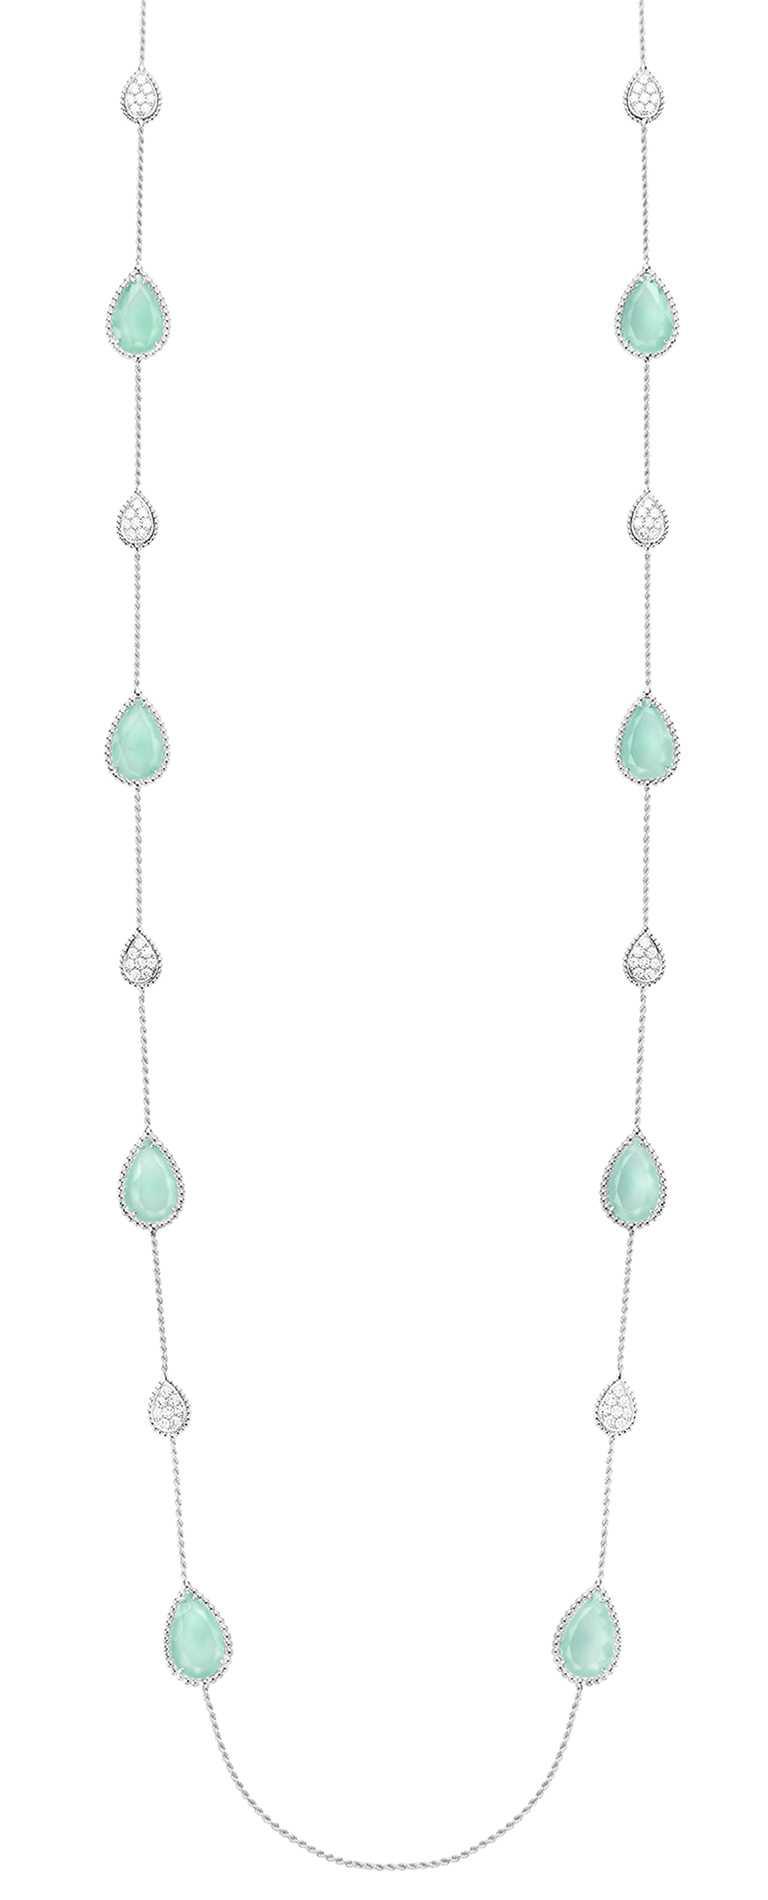 BOUCHERON「Serpent Bohème」系列,海水藍綠玉髓白金鑽石長項鍊╱1,890,000元。(圖╱BOUCHERON提供)